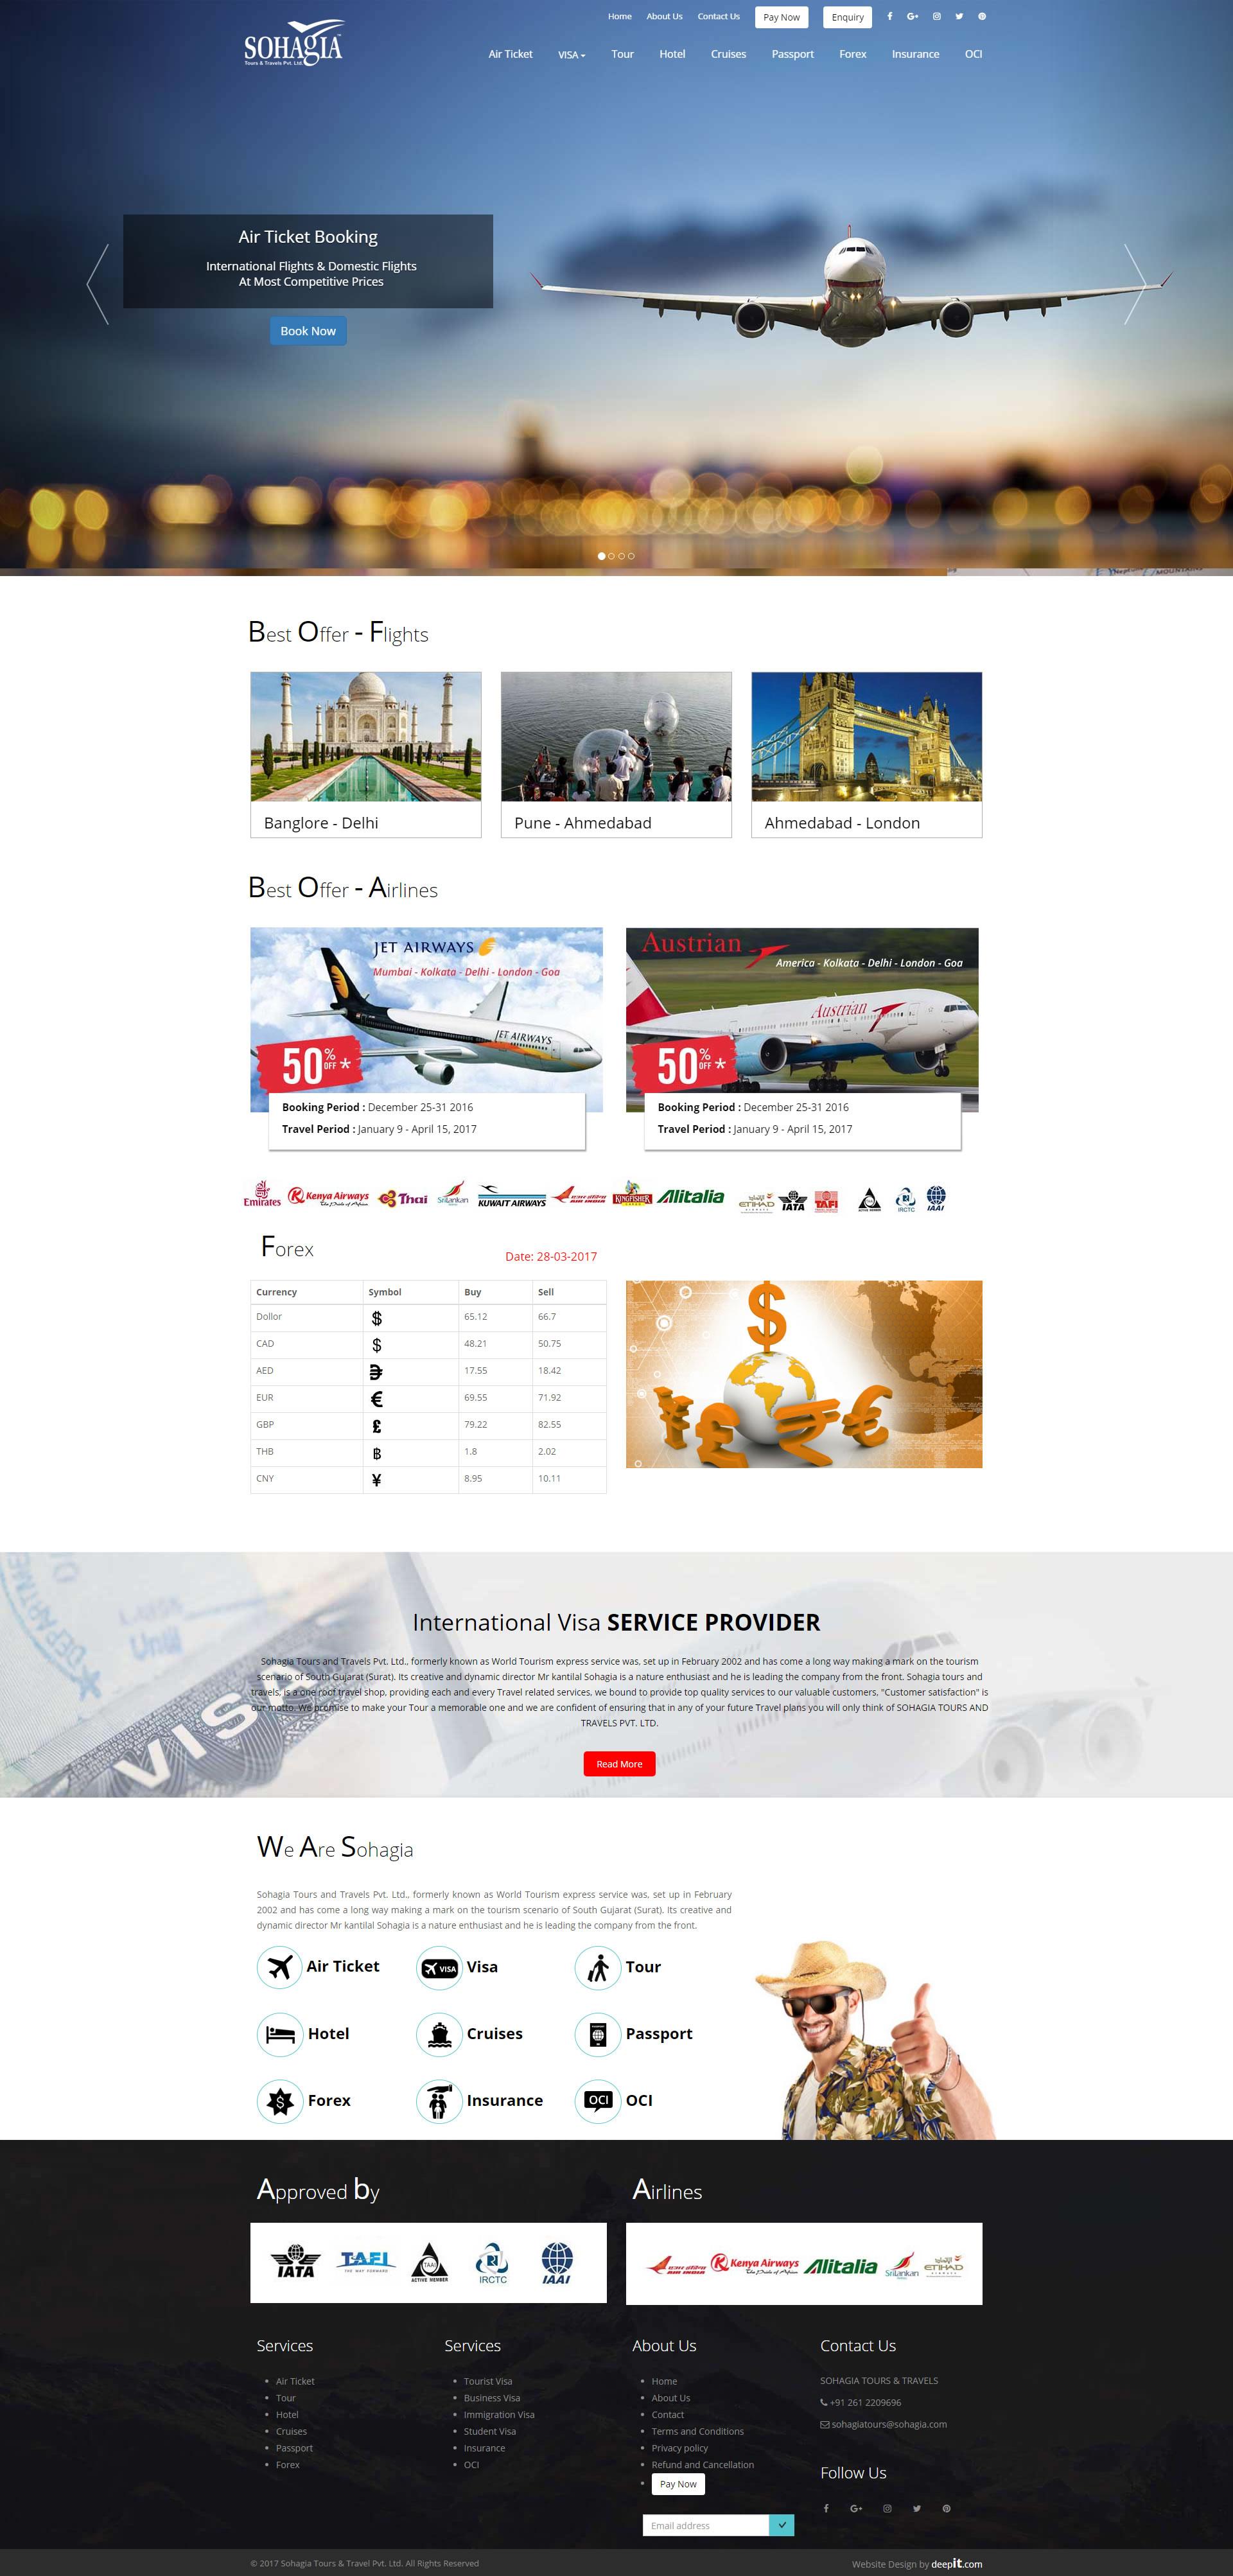 Sohagia Tours &Travels Pvt. Ltd.